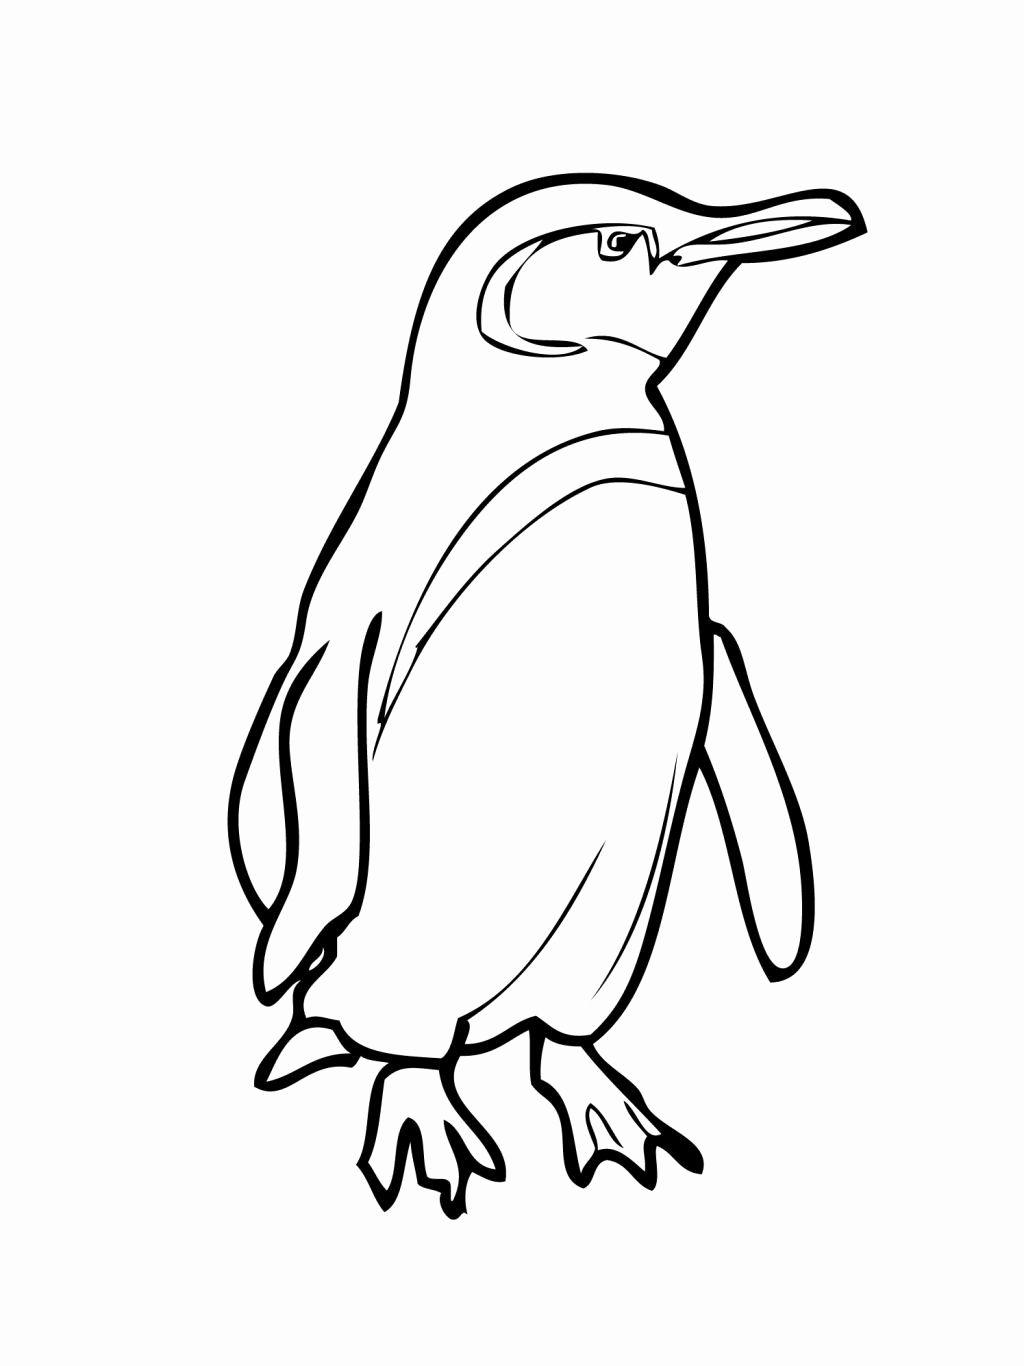 Penguin Coloring Pages Elegant Cartoon Penguin Coloring Pages Coloring Pages Penguin Coloring Penguin Coloring Pages Owl Coloring Pages